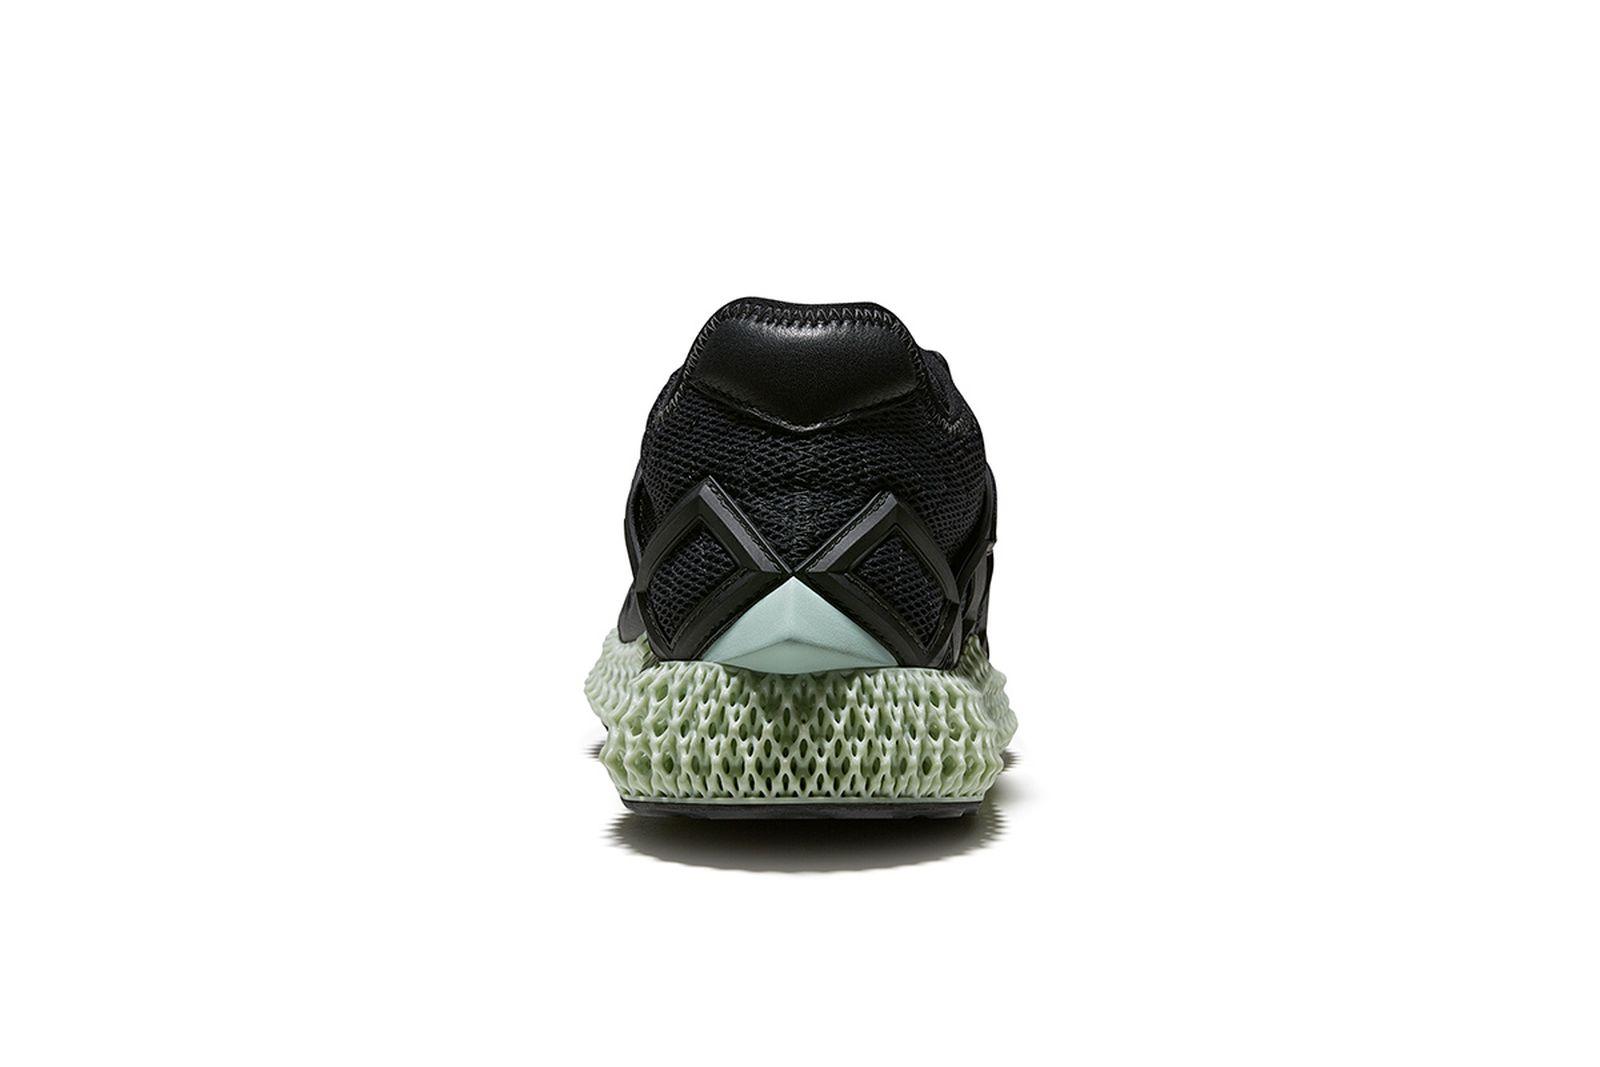 y3-runner-4d-release-date-price-01